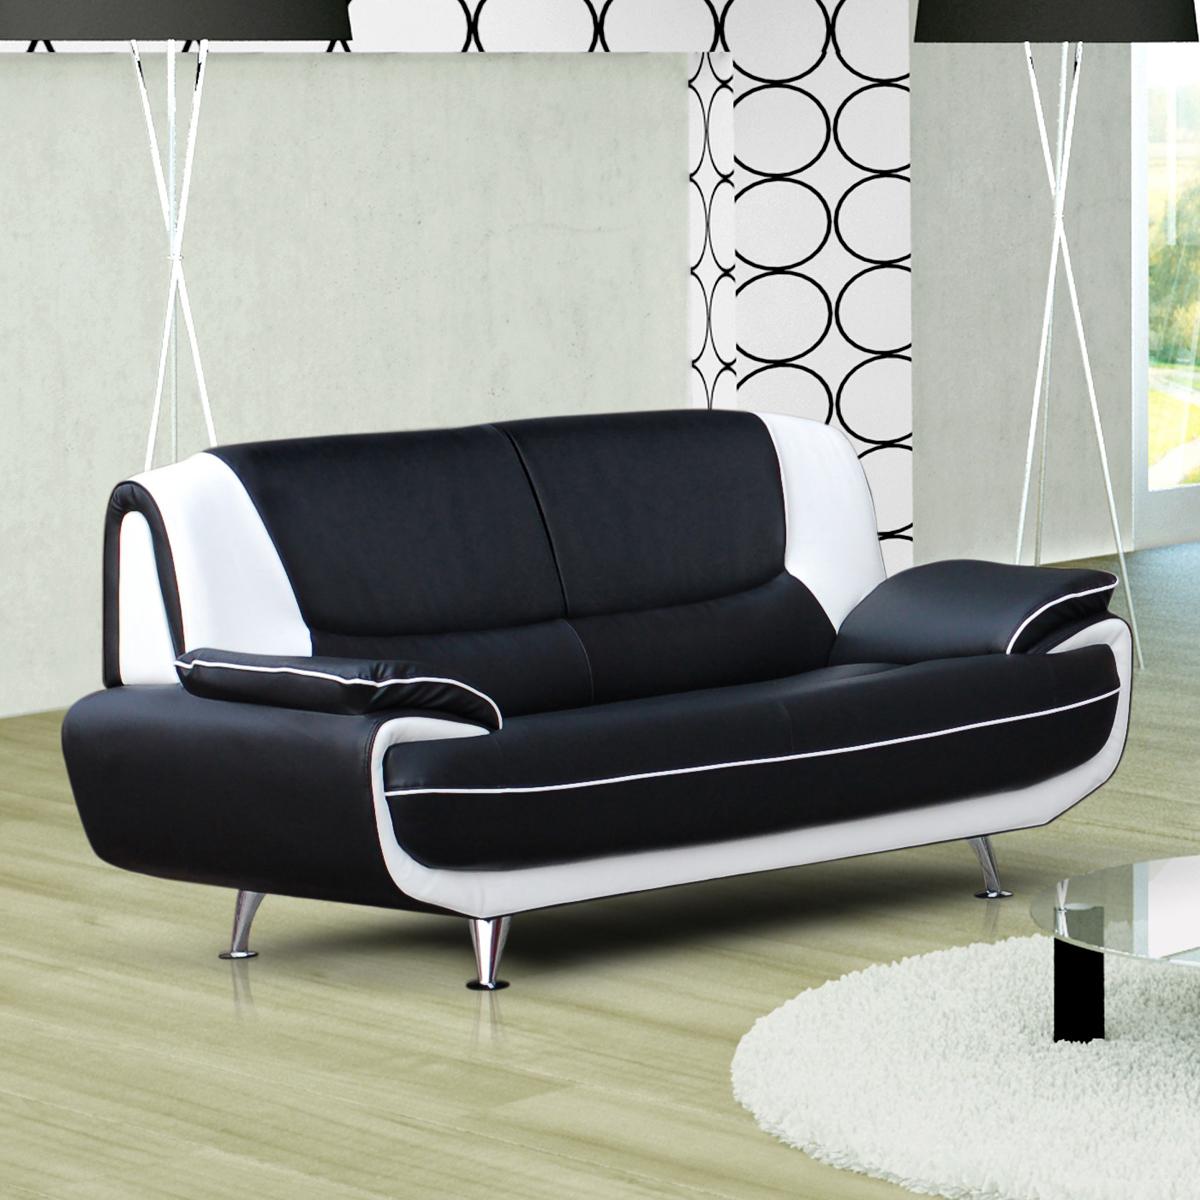 Sofa Schwarz Weiß. leather sectional sofa turino l shape with led ...